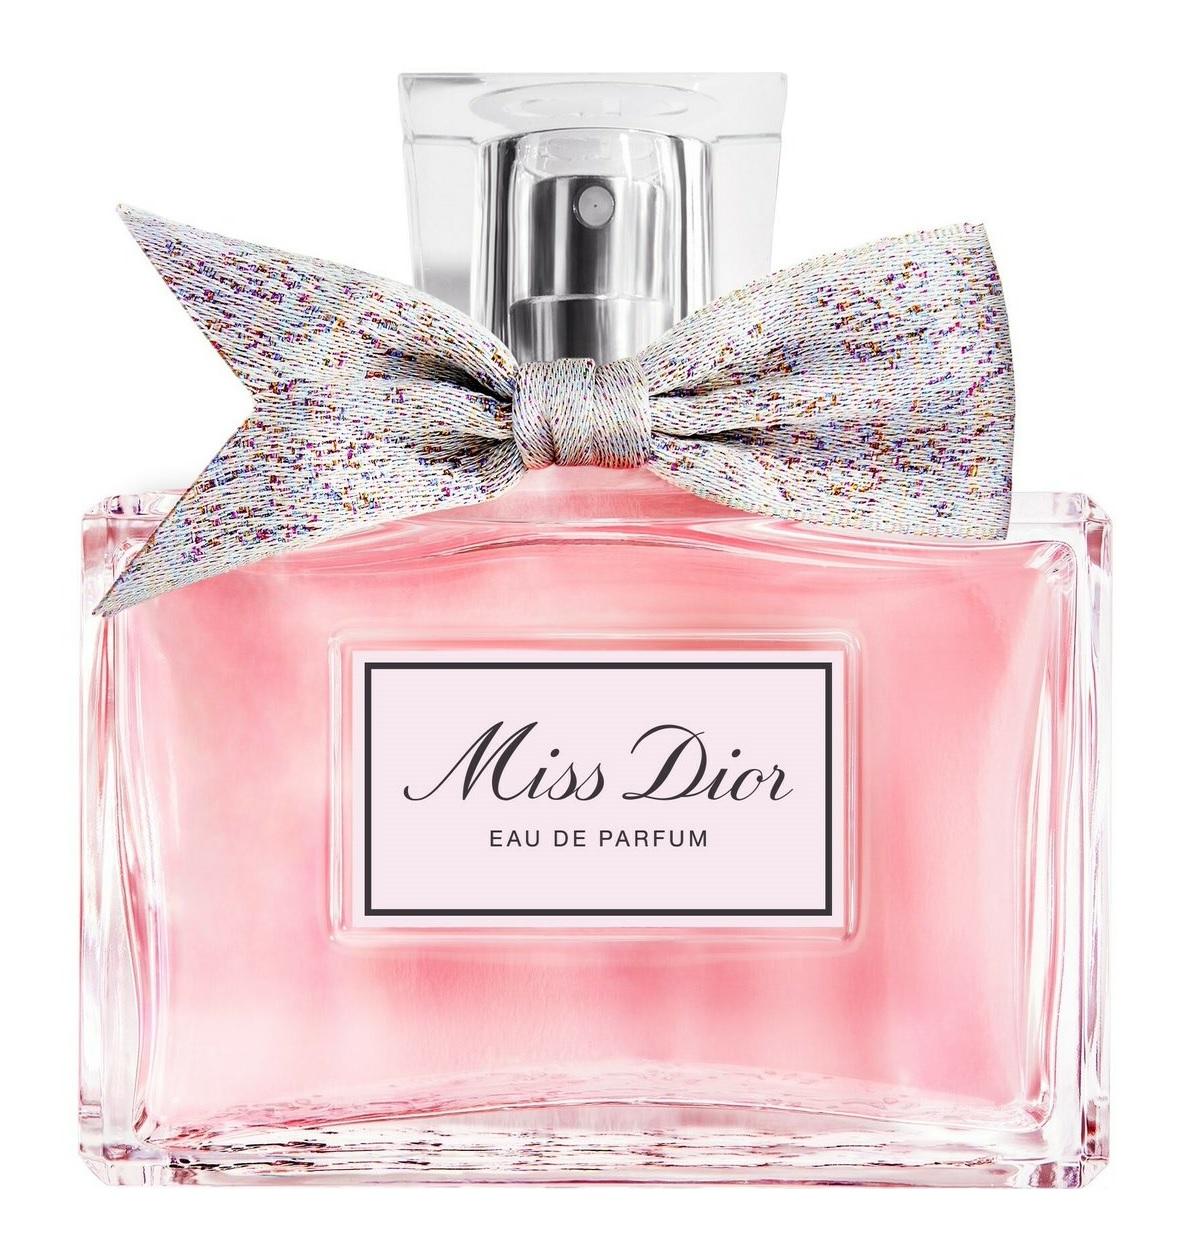 Botella Mis Dior Eau De Parfum 2021